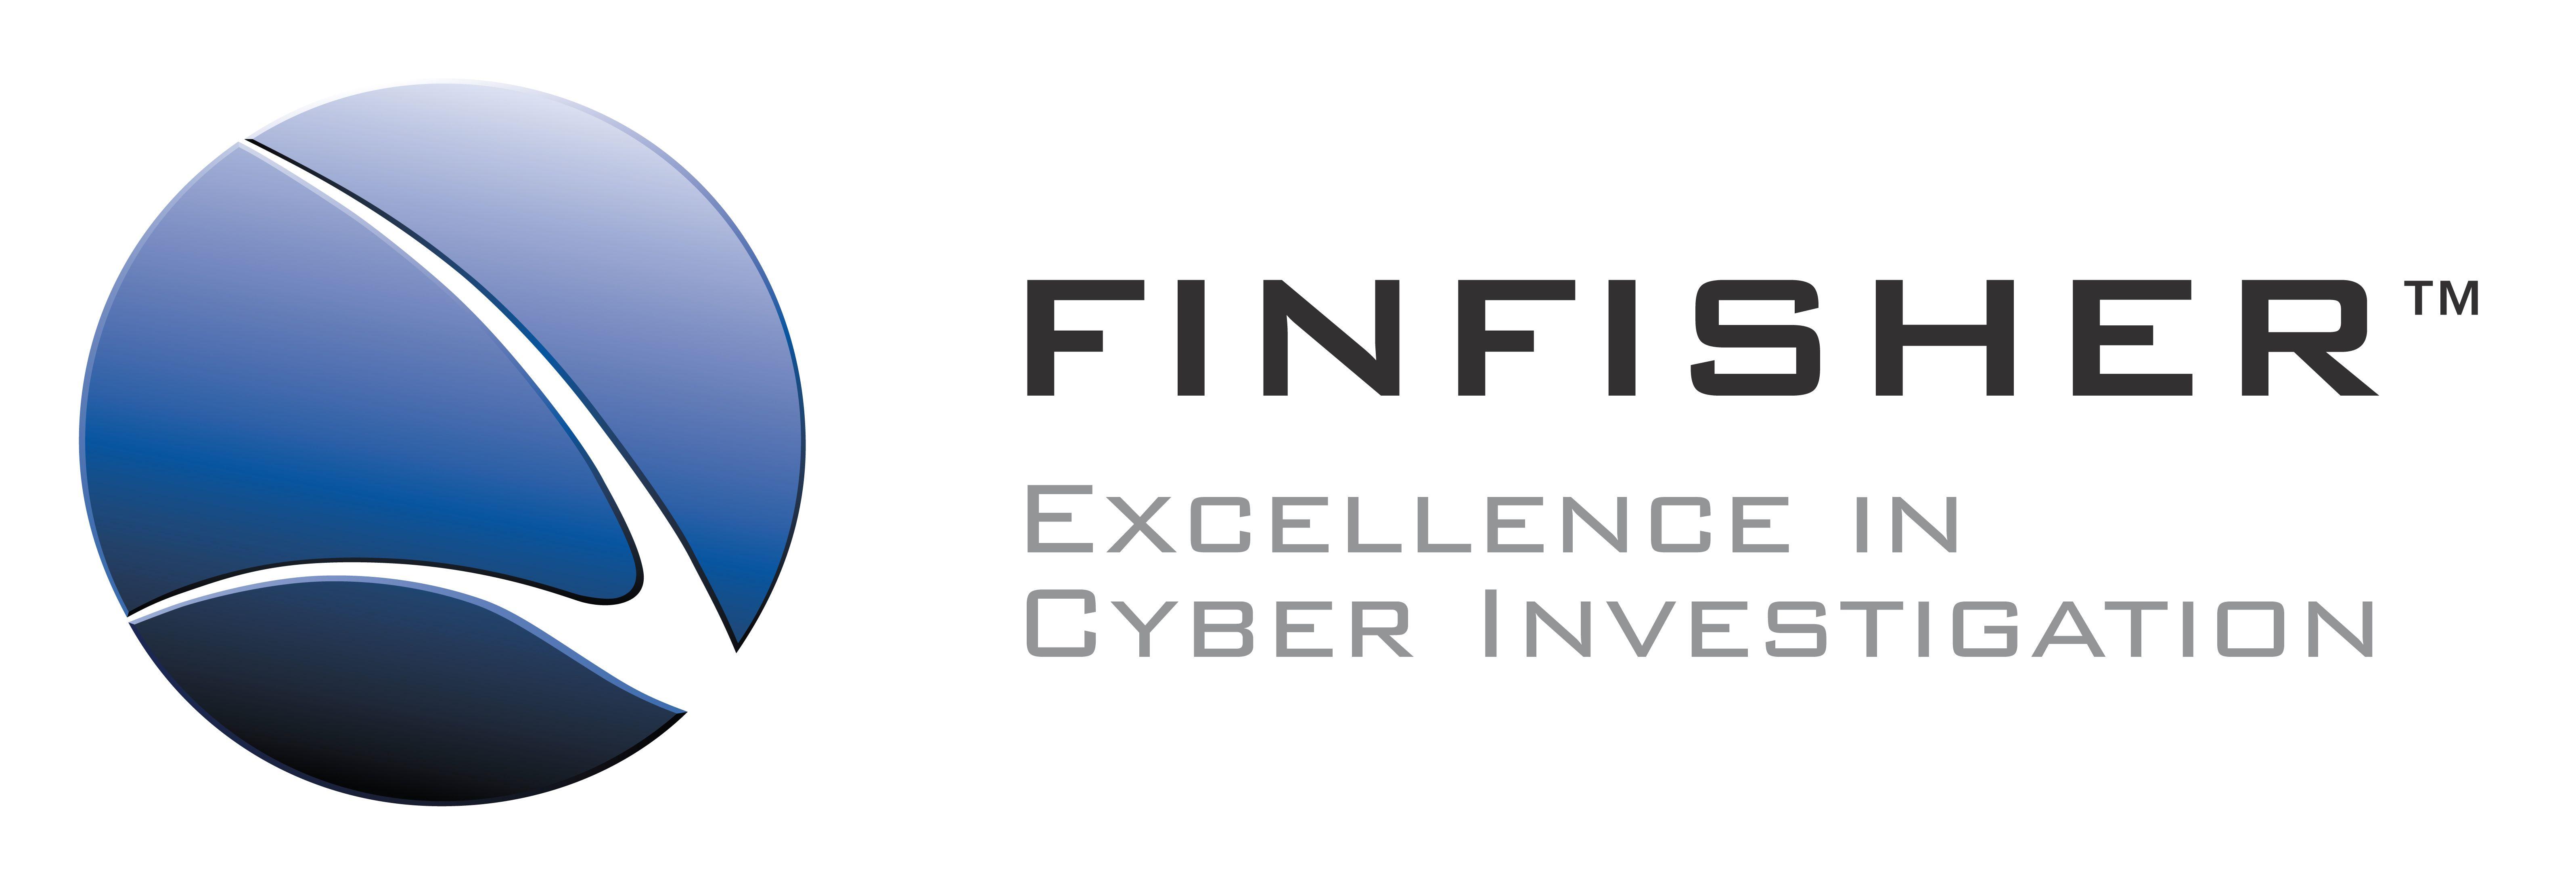 FinFisher GmbH